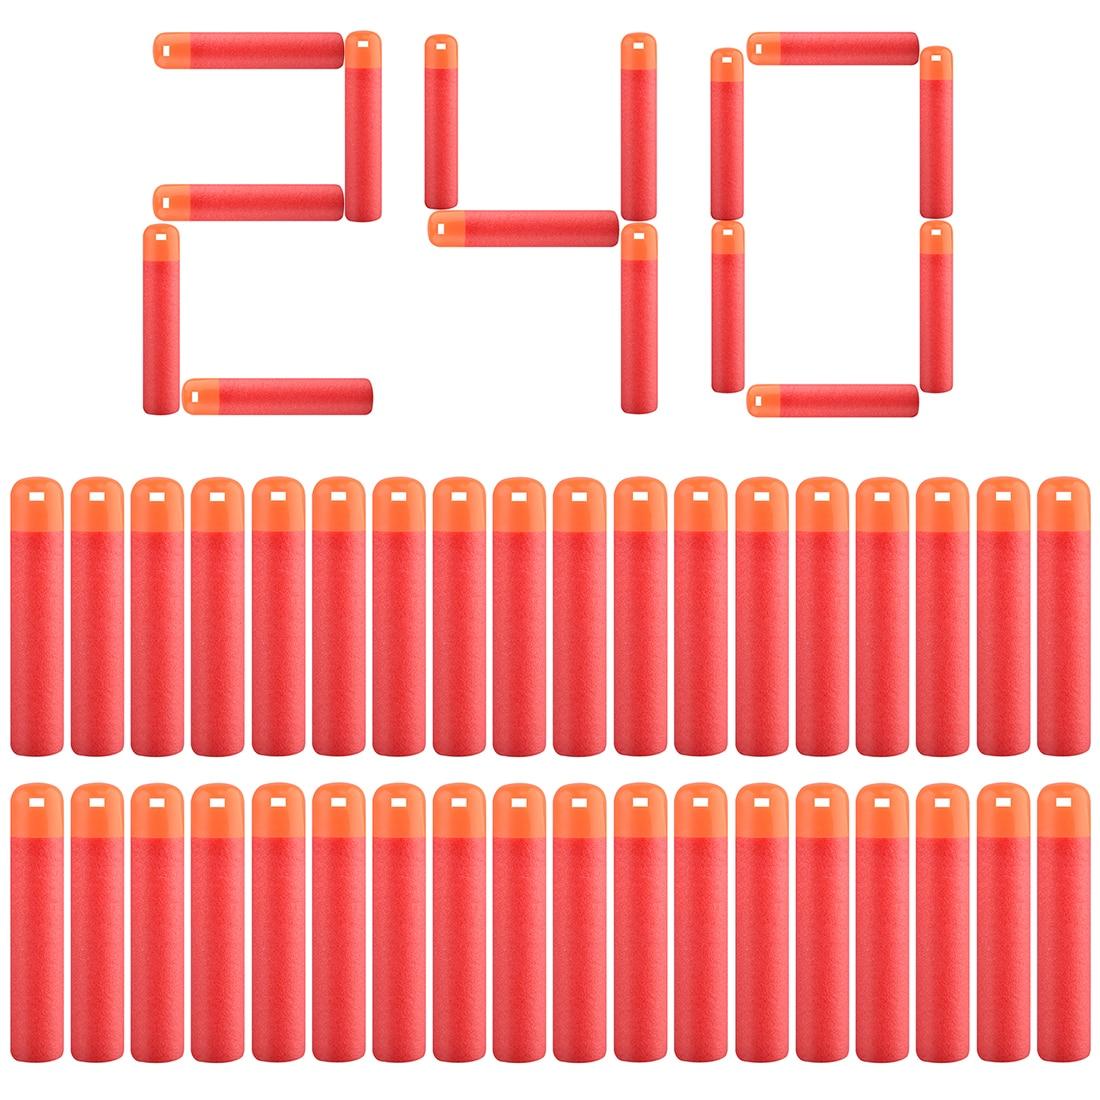 30pcs/60pcs/120pcs/240pcs Soft Bullet Hollow Soft Head Foam Bullets For Nerf  For Mega Series - Red